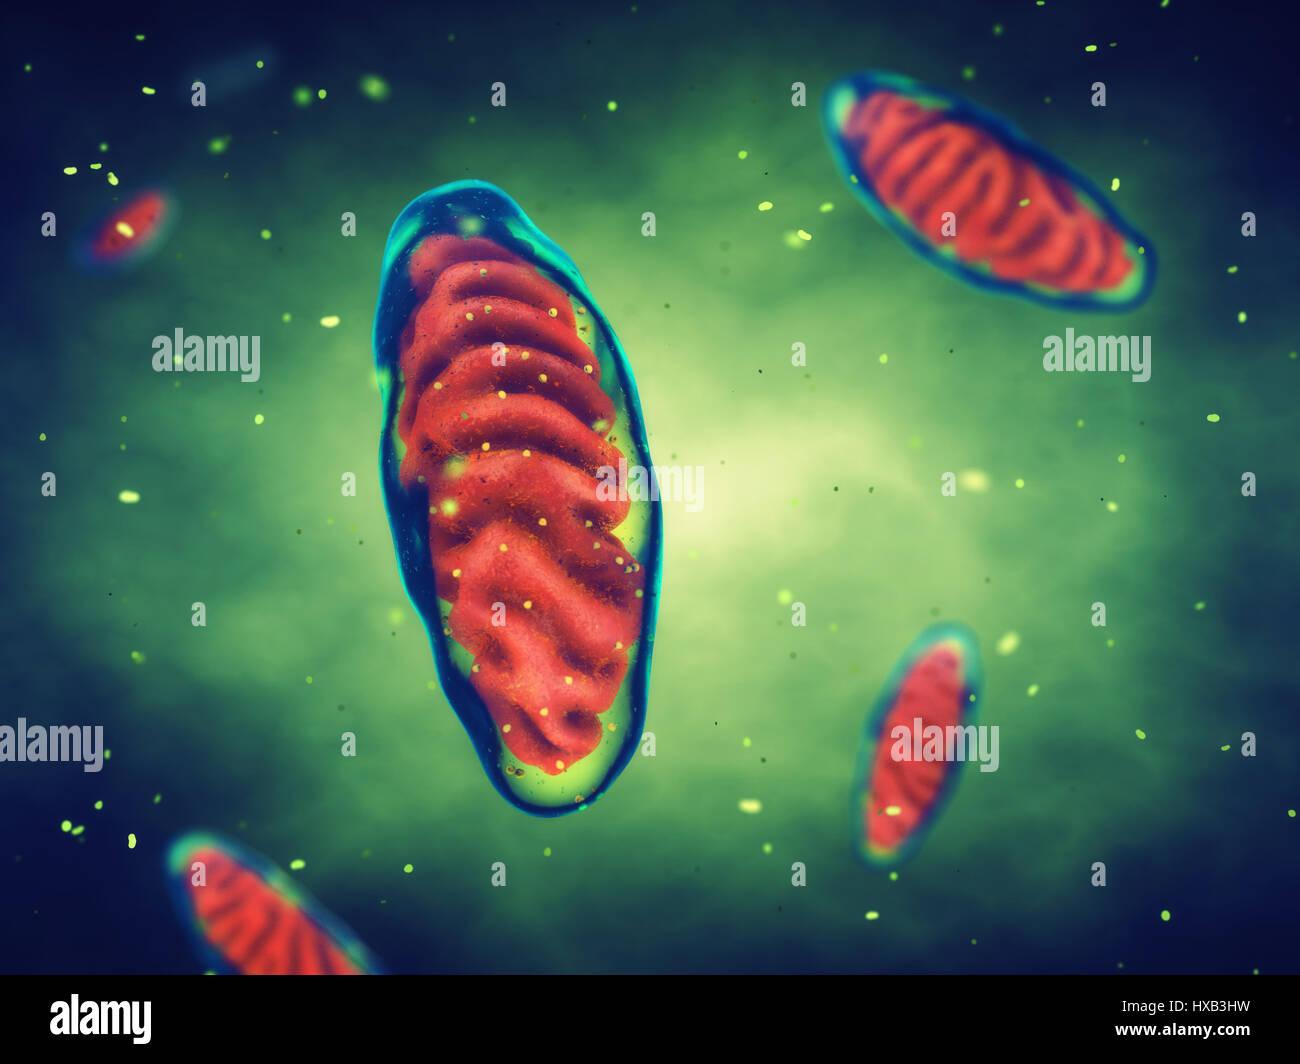 Mitochondrien, Zellenenergie, Zellatmung Stockfoto